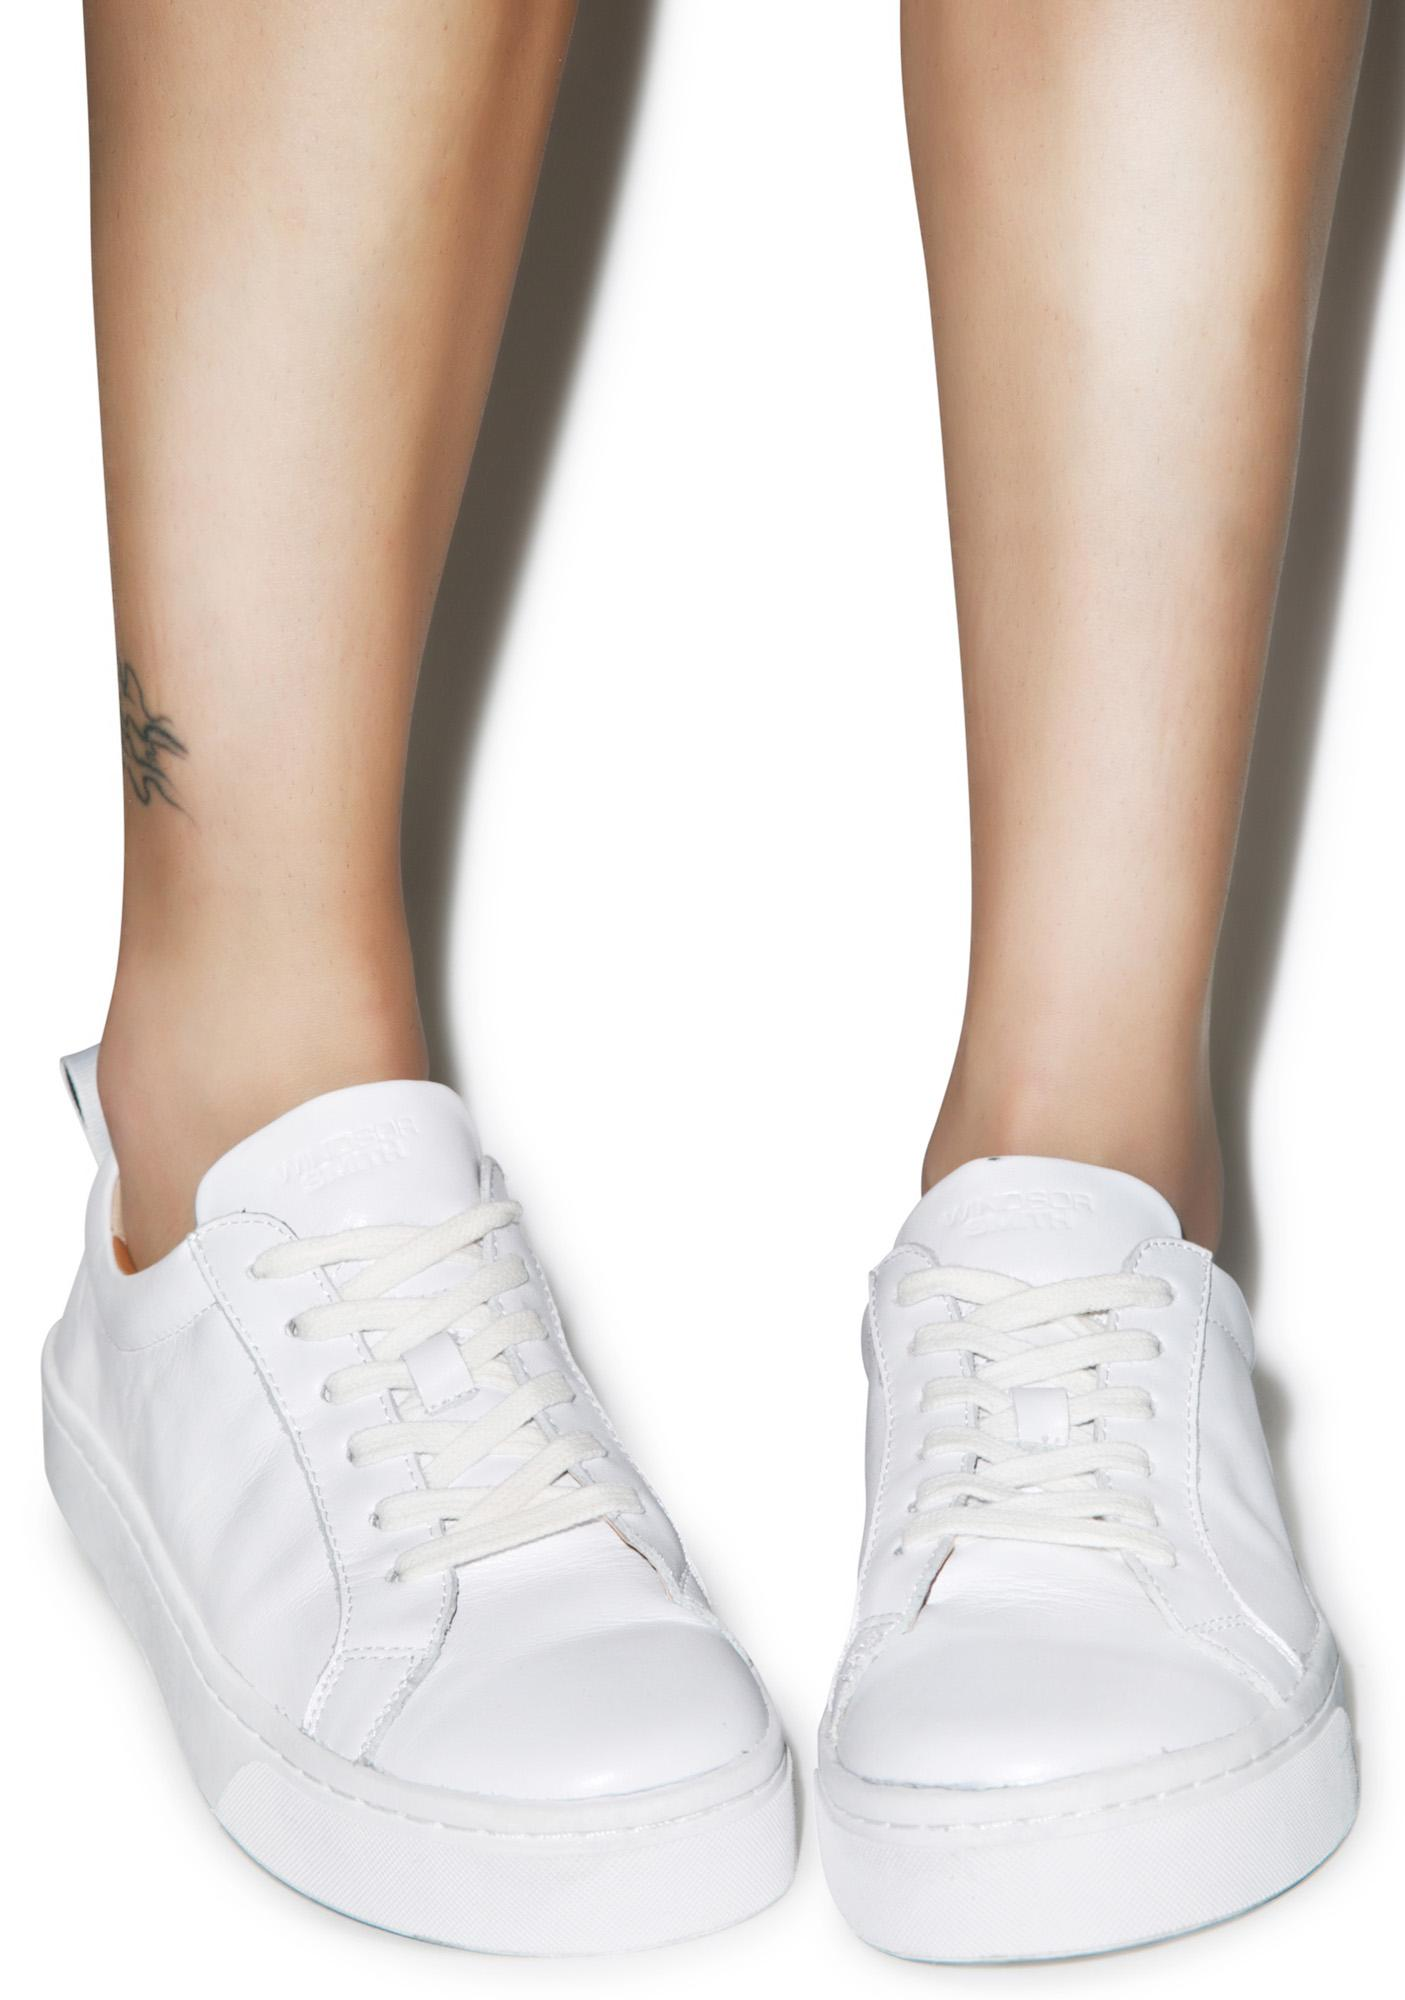 Windsor Smith Sawyer Sneakers